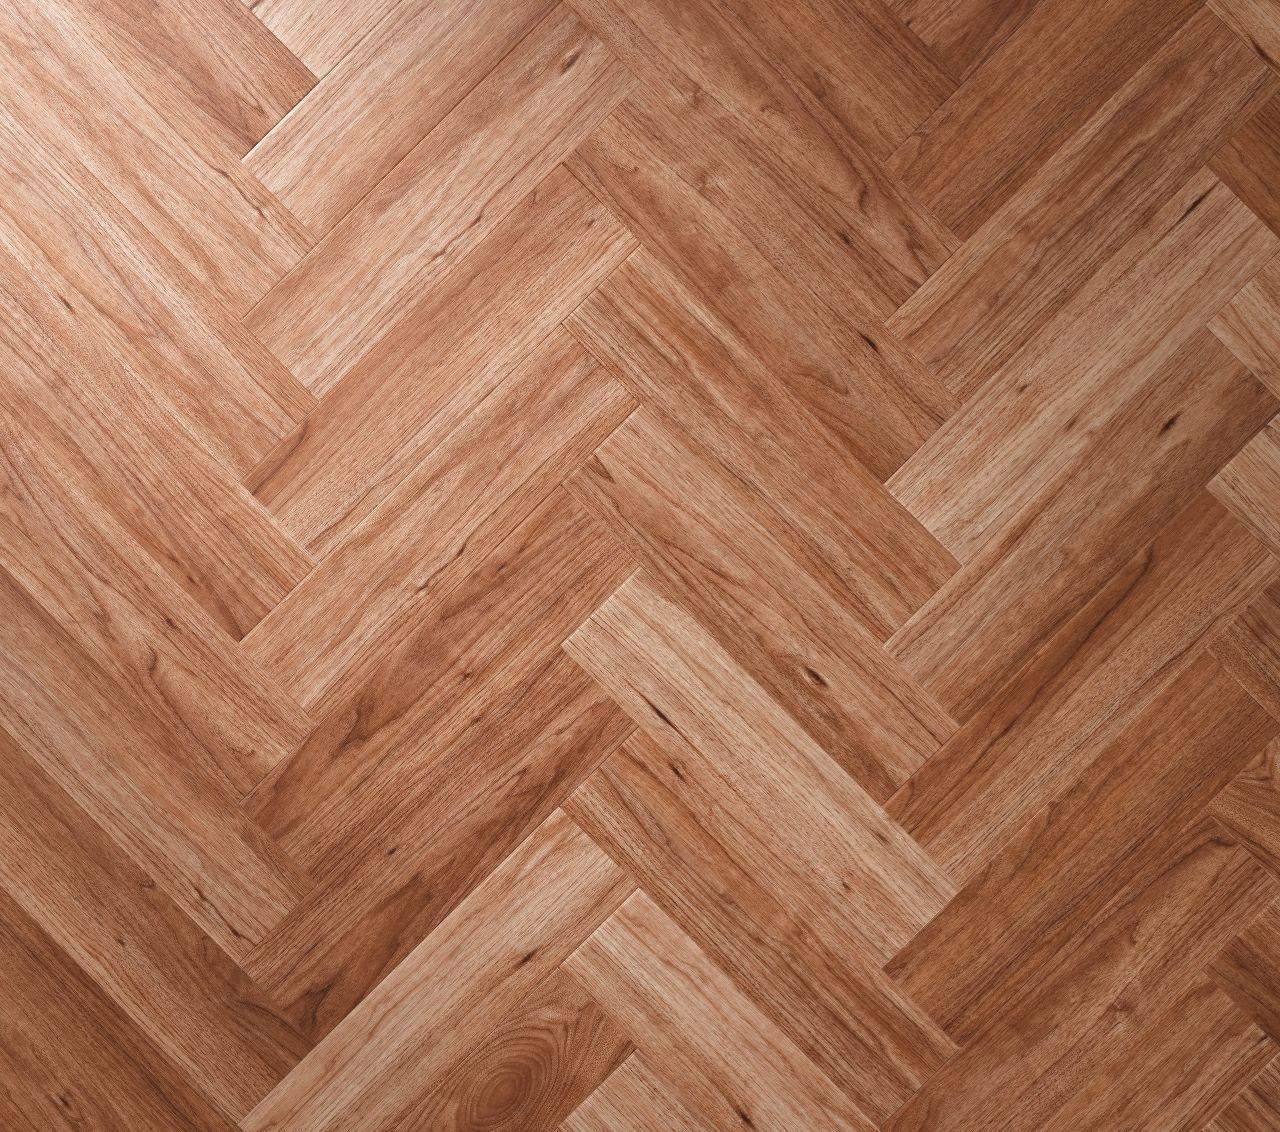 Comfortable 12X12 Ceiling Tile Replacement Thin 18 Floor Tile Regular 2X4 Drop Ceiling Tiles Home Depot 2X4 Subway Tile Youthful 2X8 Subway Tile Brown3X6 White Subway Tile Lowes Herringbone Tile Pattern 6x24 | ... Herringbone Tile Layout Design ..